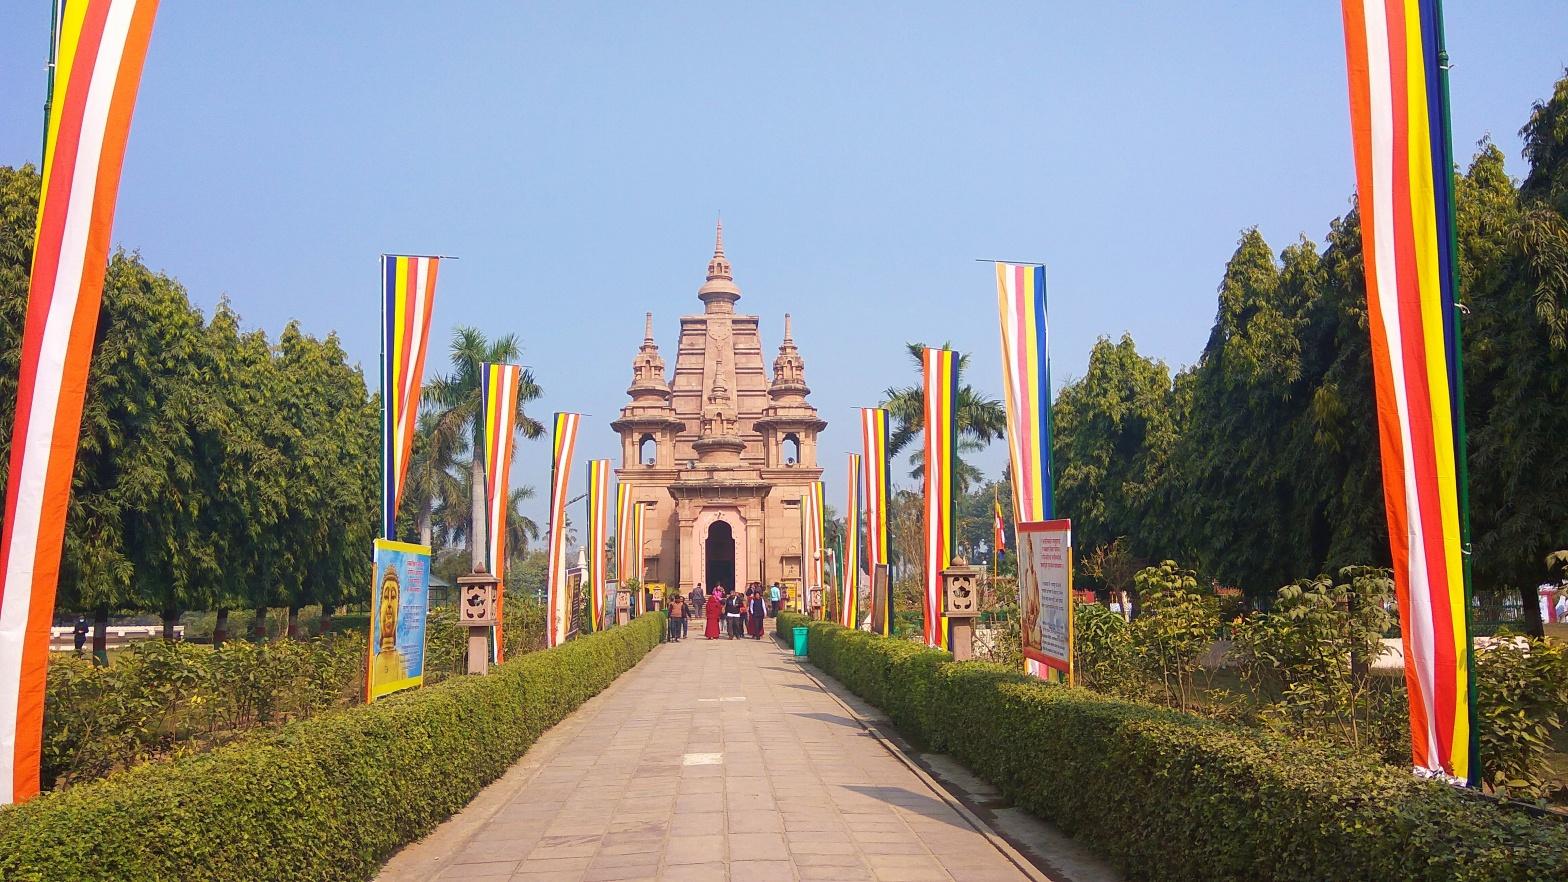 Mulagandha Kuti Vihara, Sarnath, Varanasi, Uttar Pradesh, India